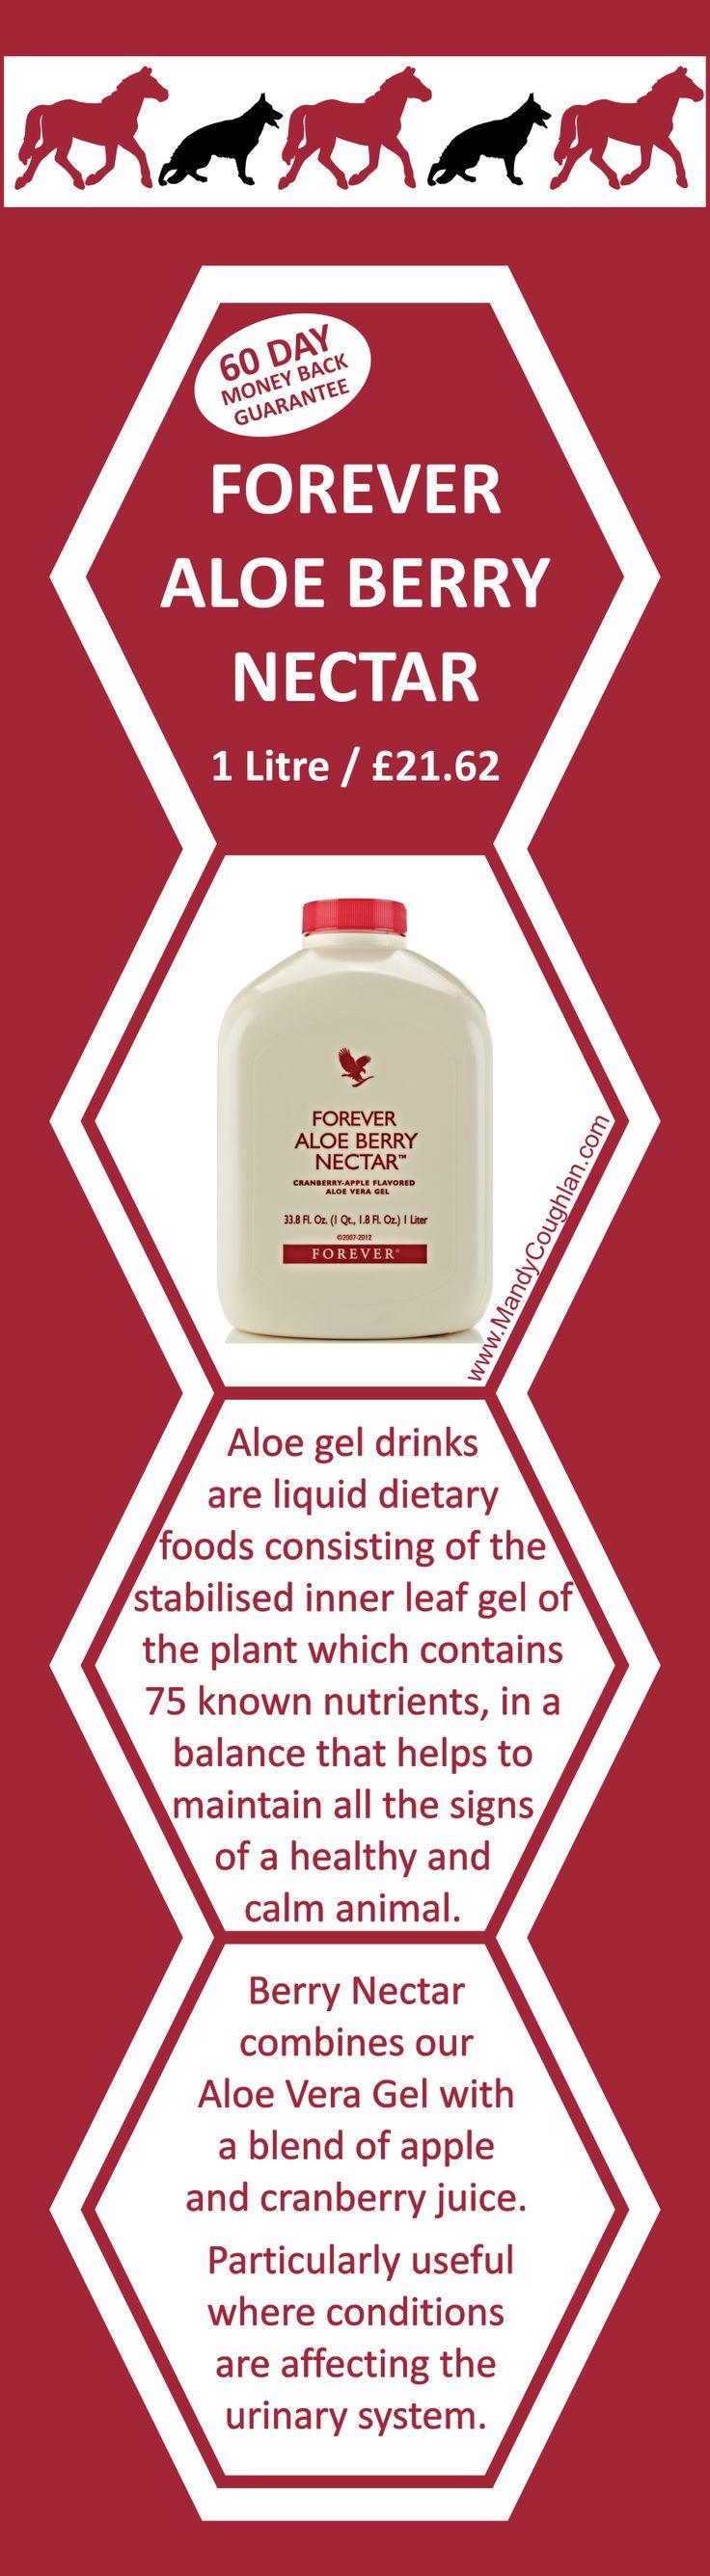 Aloe Berry Nectar, http://www.be-forever.de/aloevera-wellness-shop/